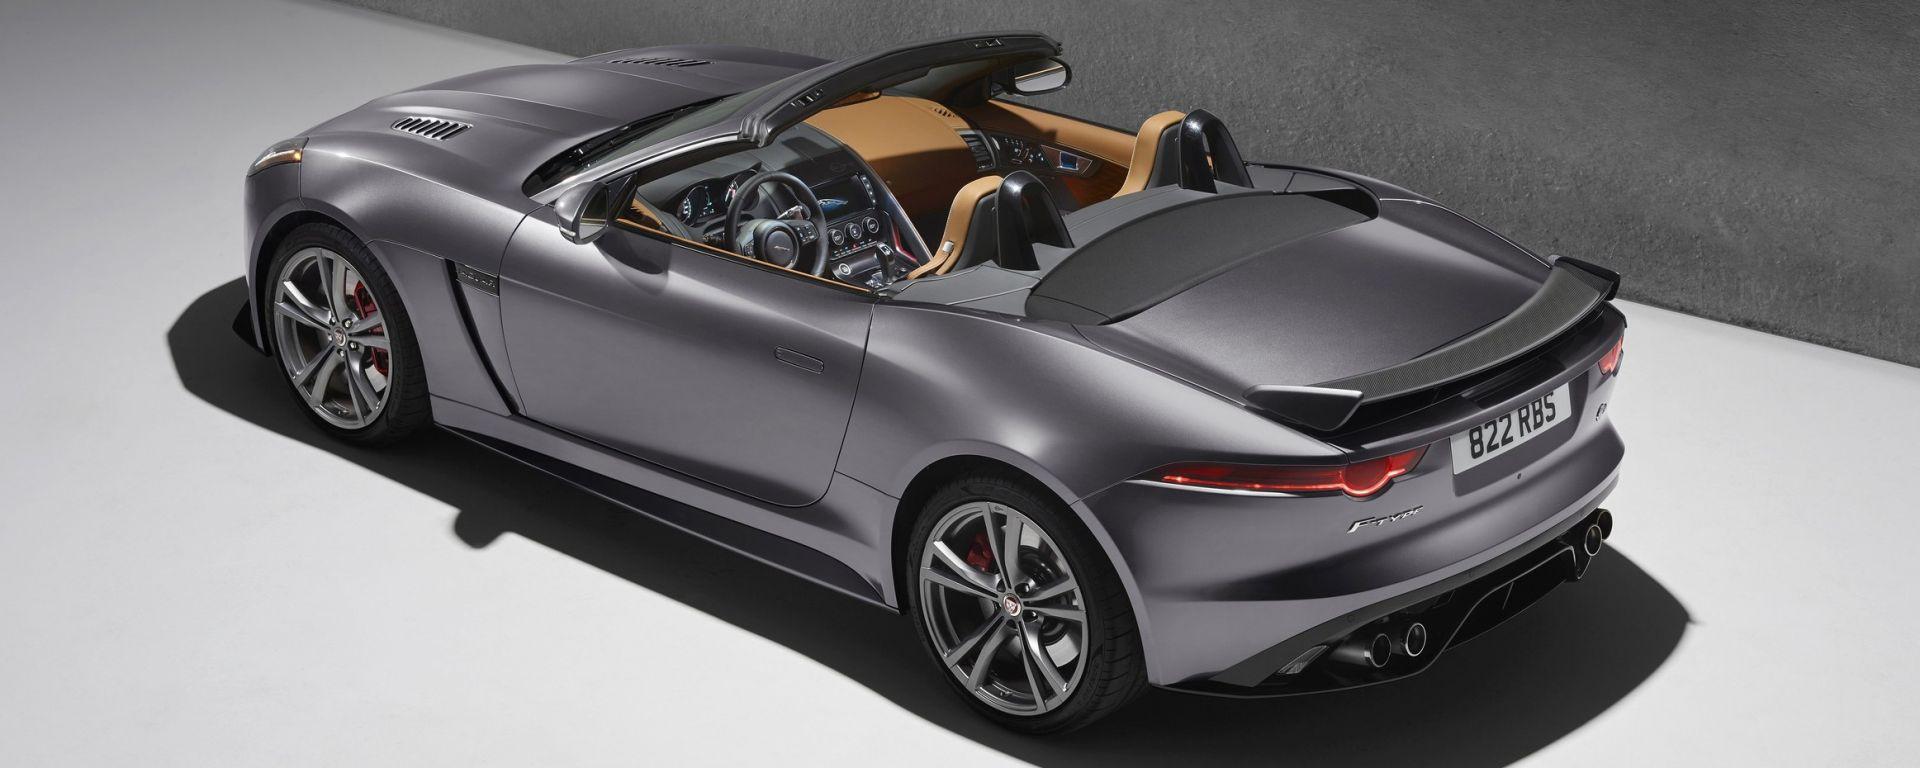 Jaguar F-Type SVR: foto e video ufficiali